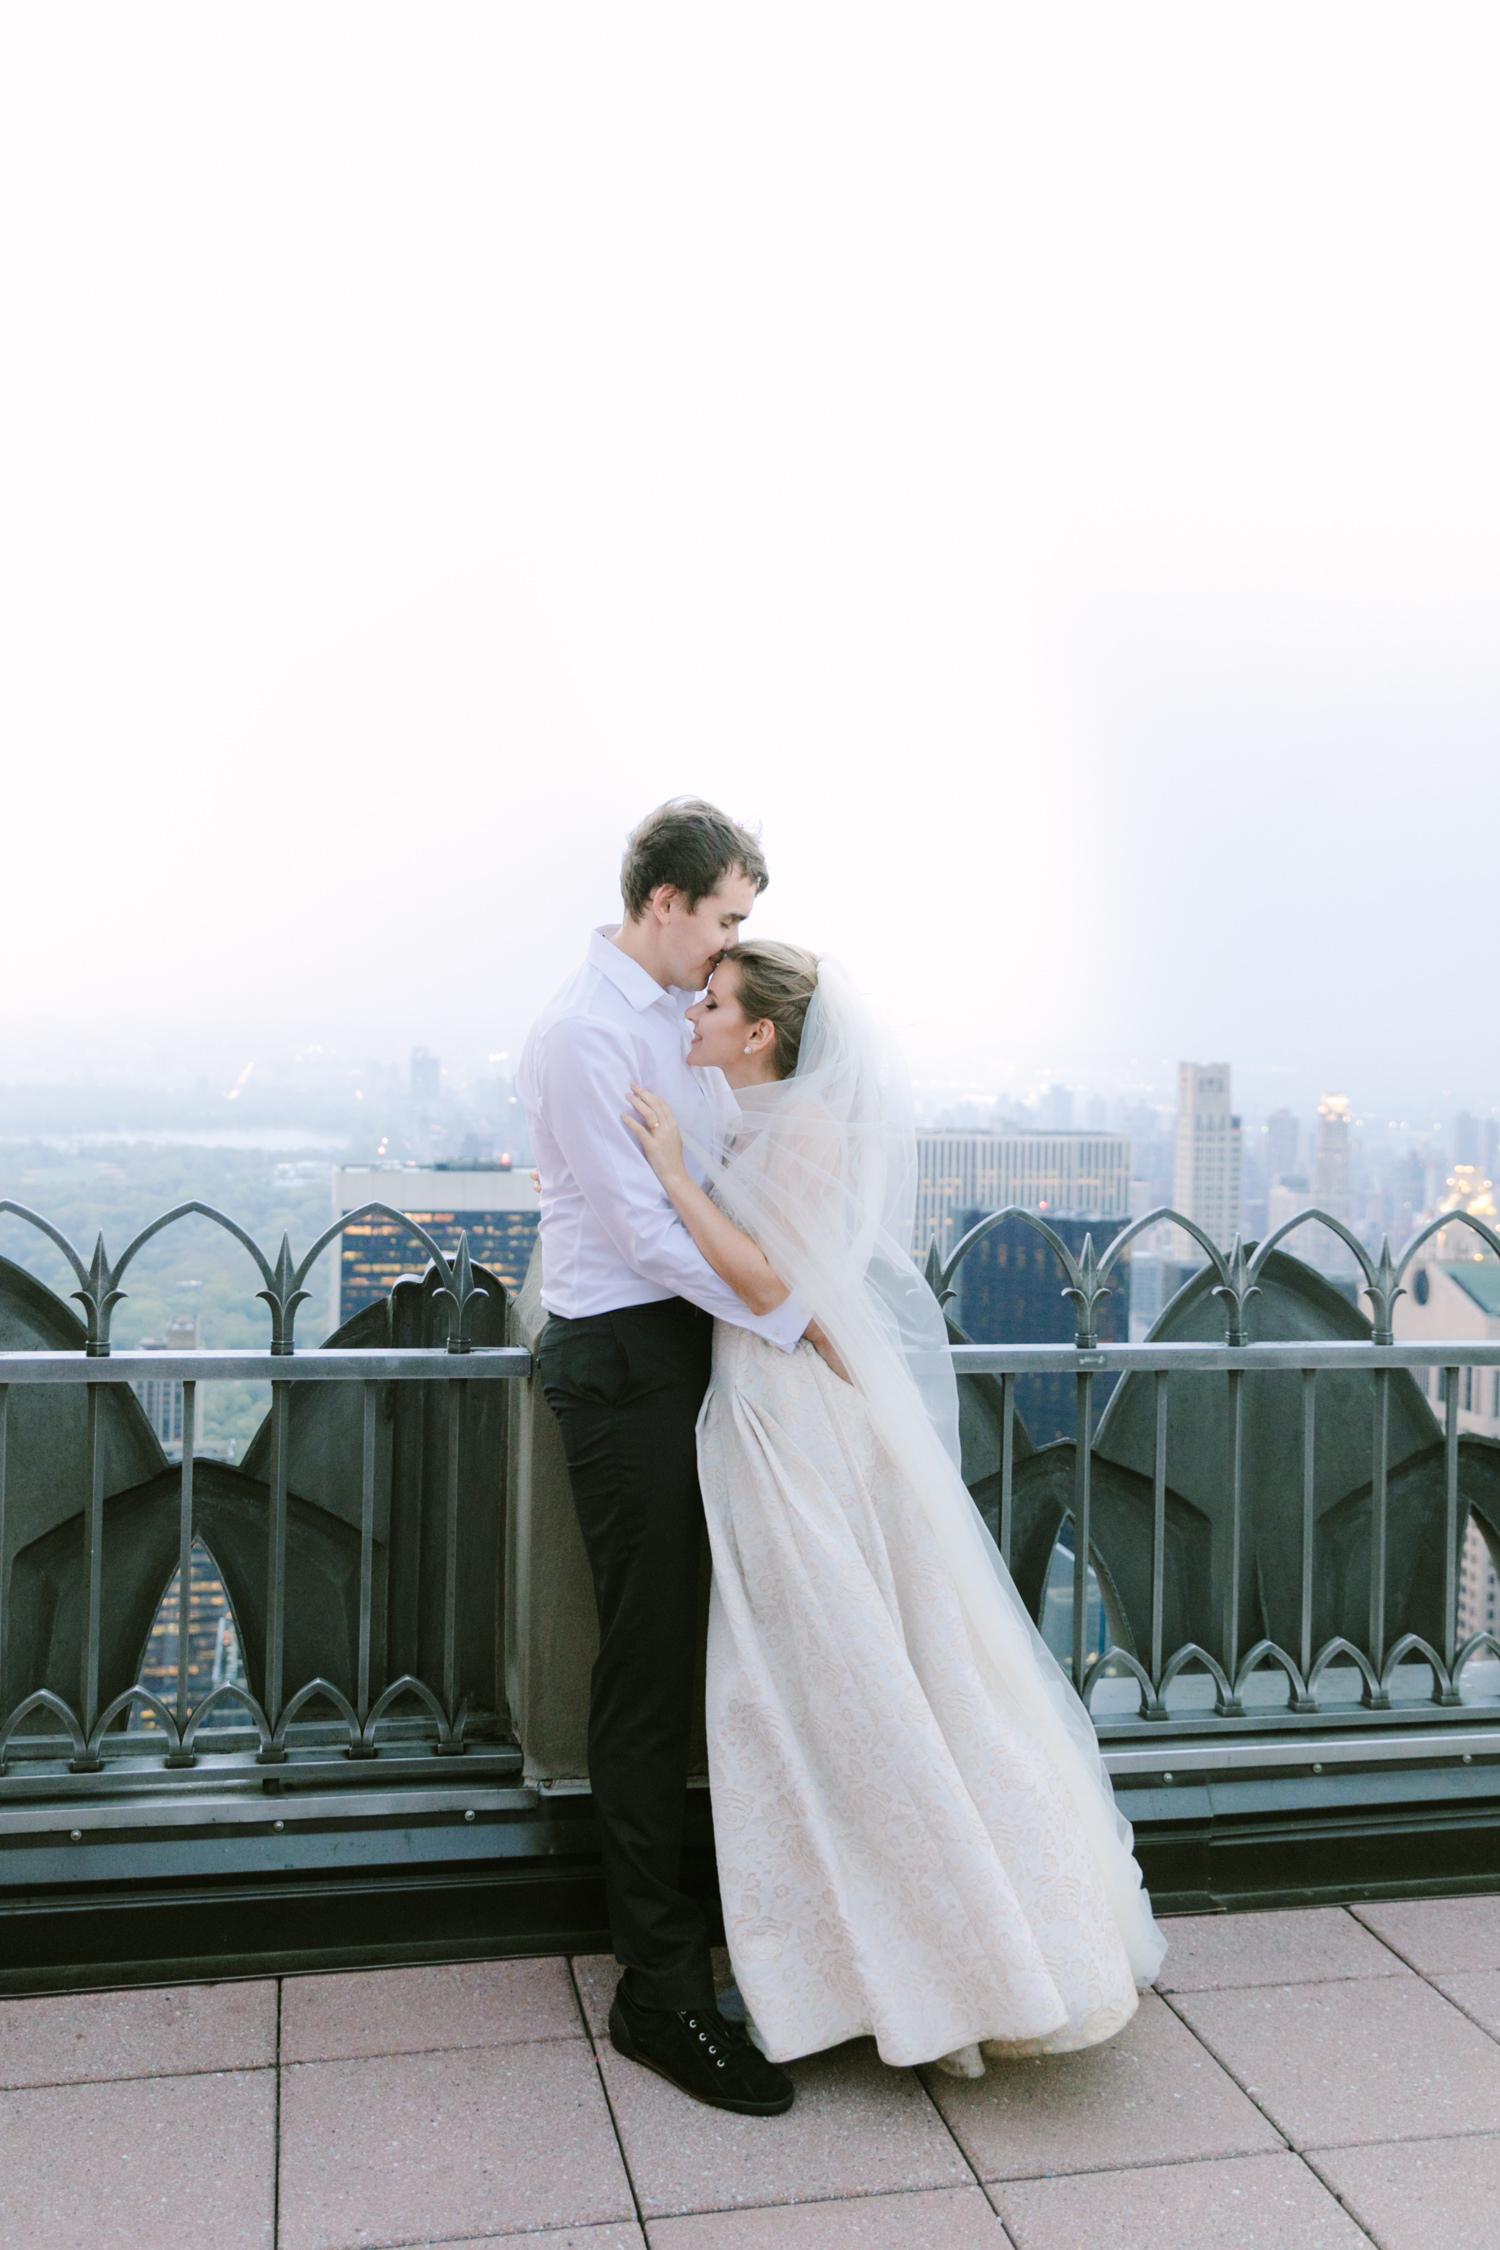 NYC-Top-of-the-Rock-wedding-photos-L&B-23.jpg